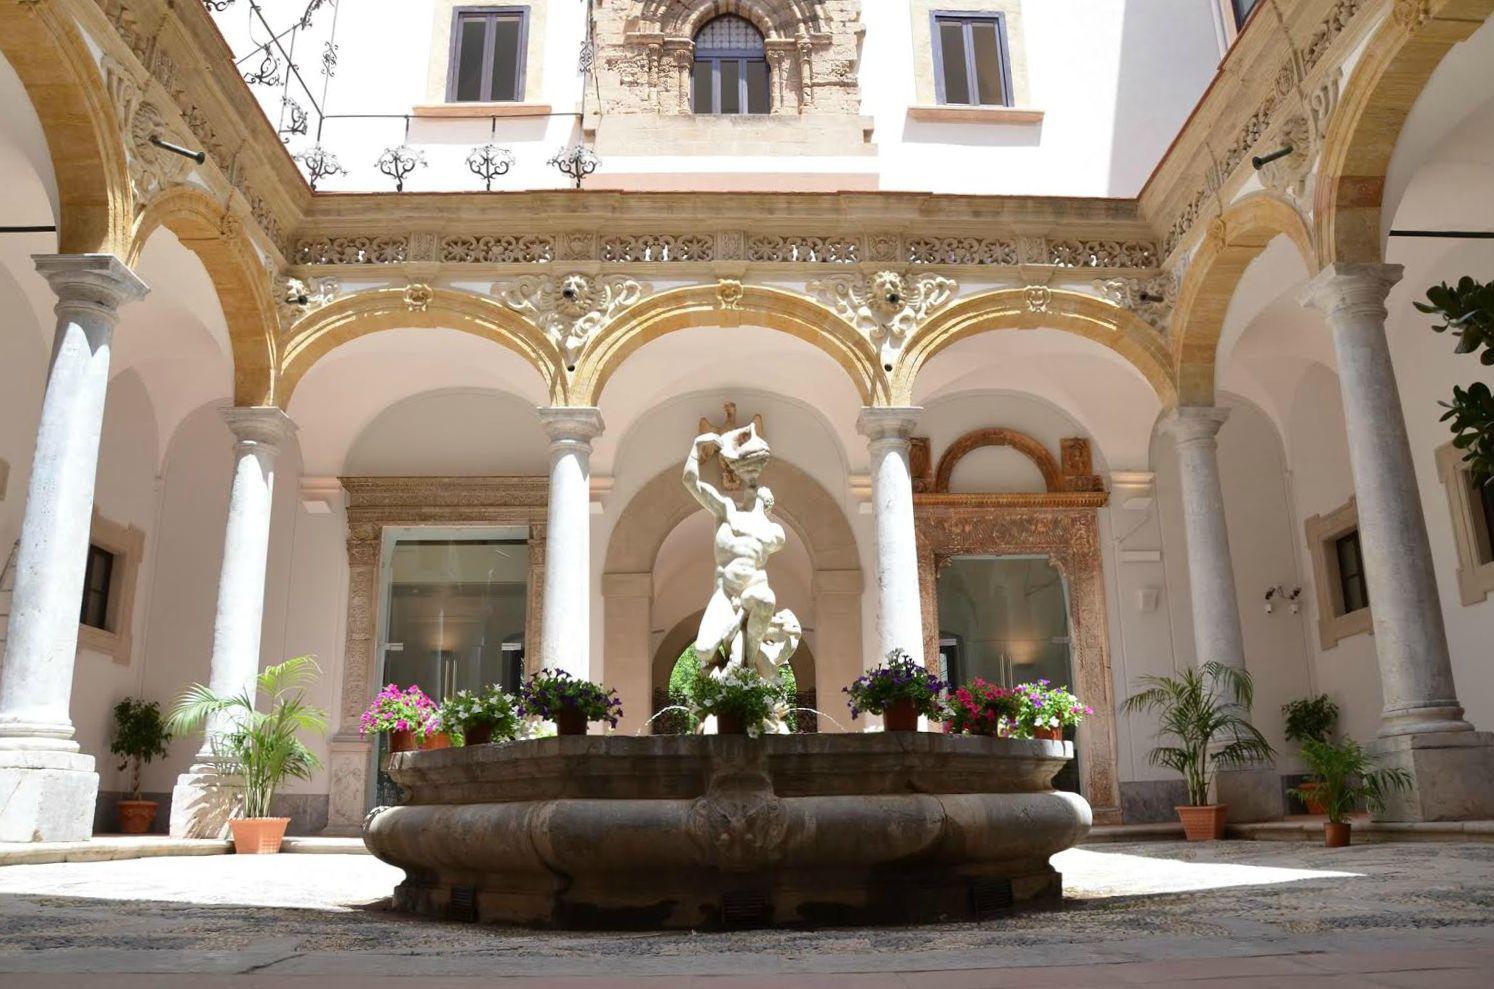 I falsi archeologici del Museo Salinas di Palermo. Flavia Frisone racconta l'avvincente storia di di una beffa